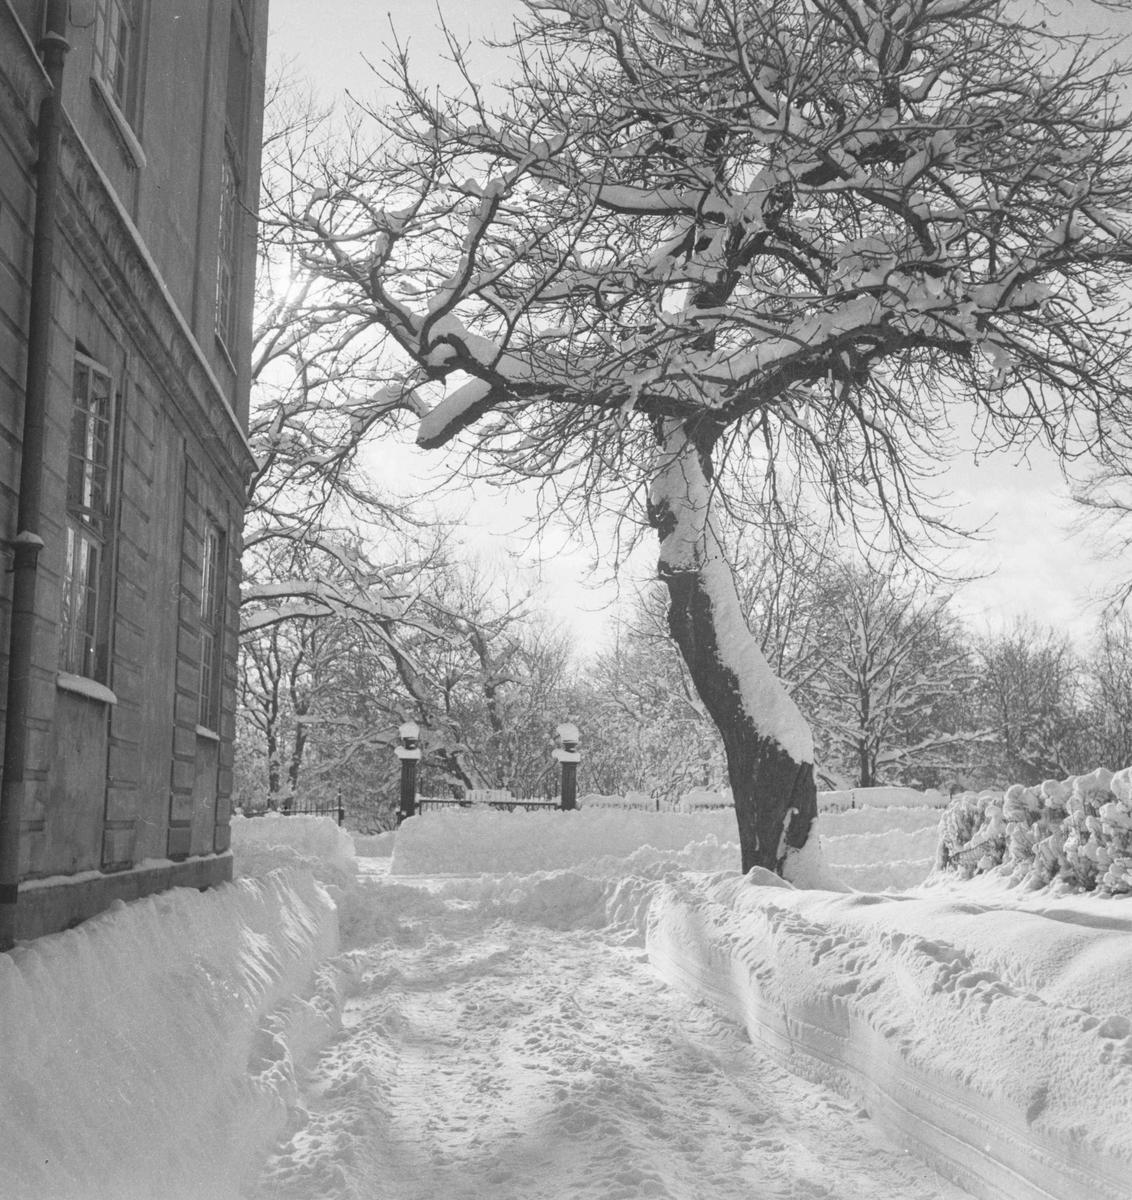 Vinter i byen